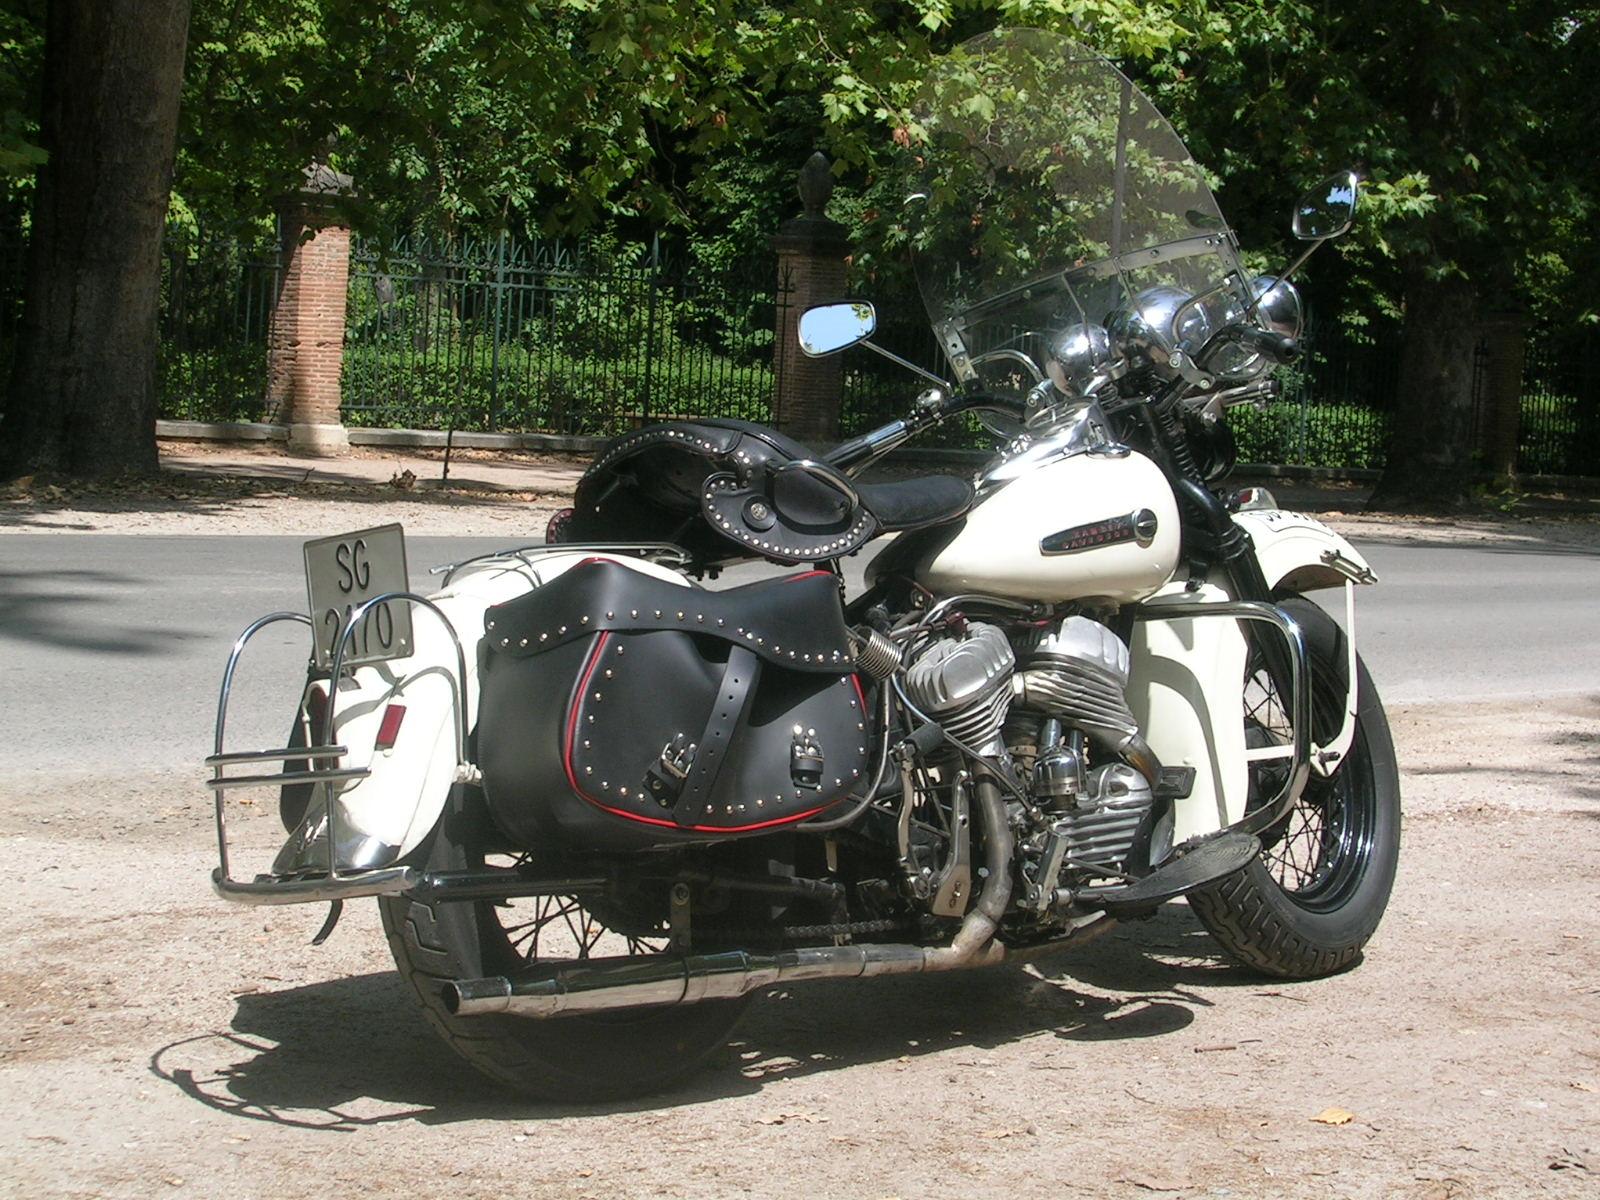 2006 - Harley-Davidson WL45